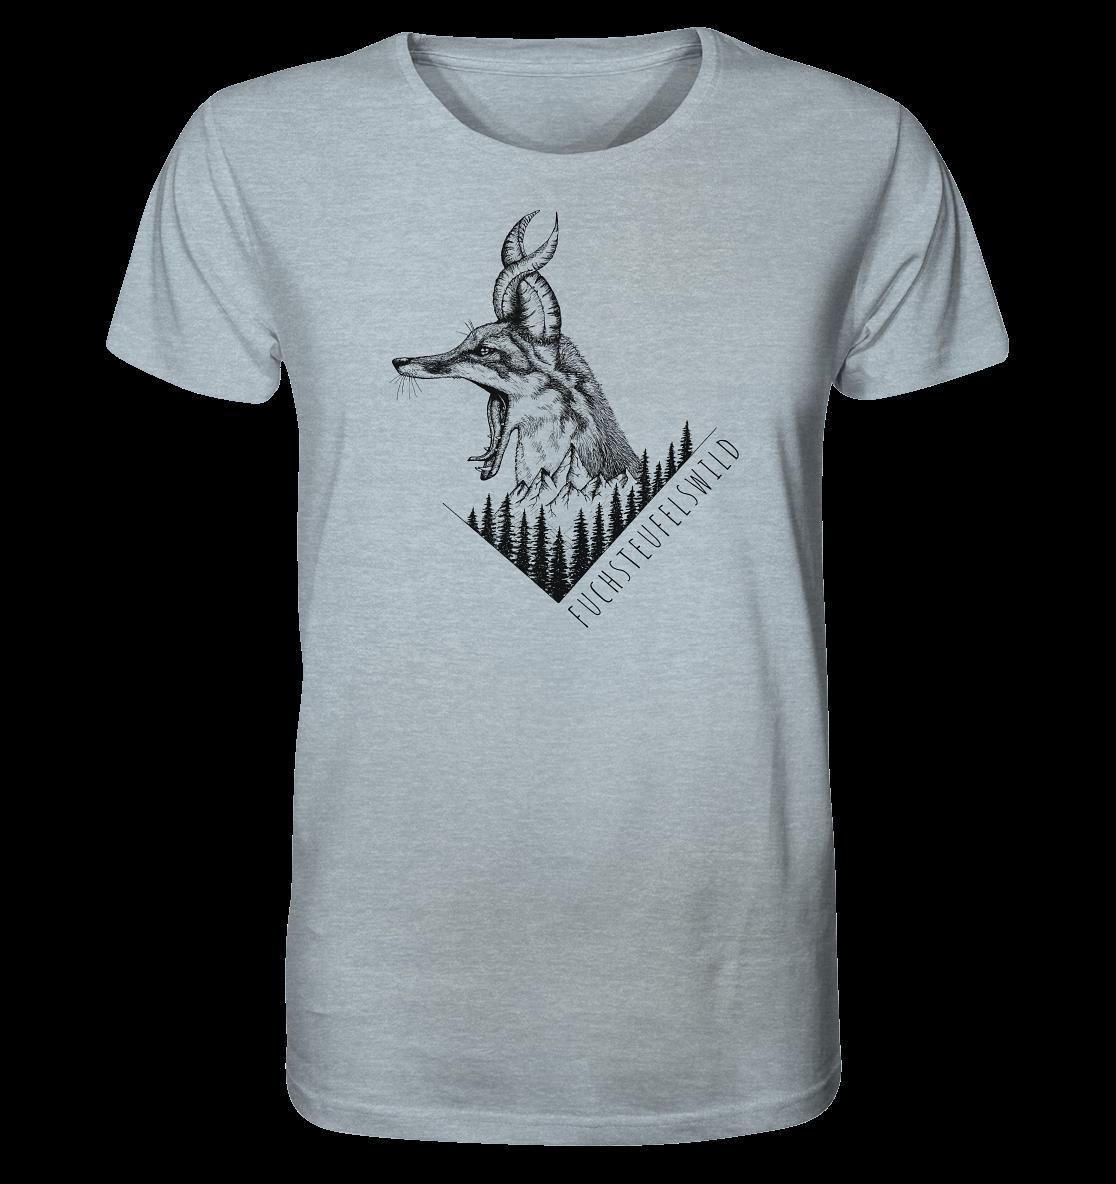 front-organic-shirt-meliert-adbfcb-1116x-4.png